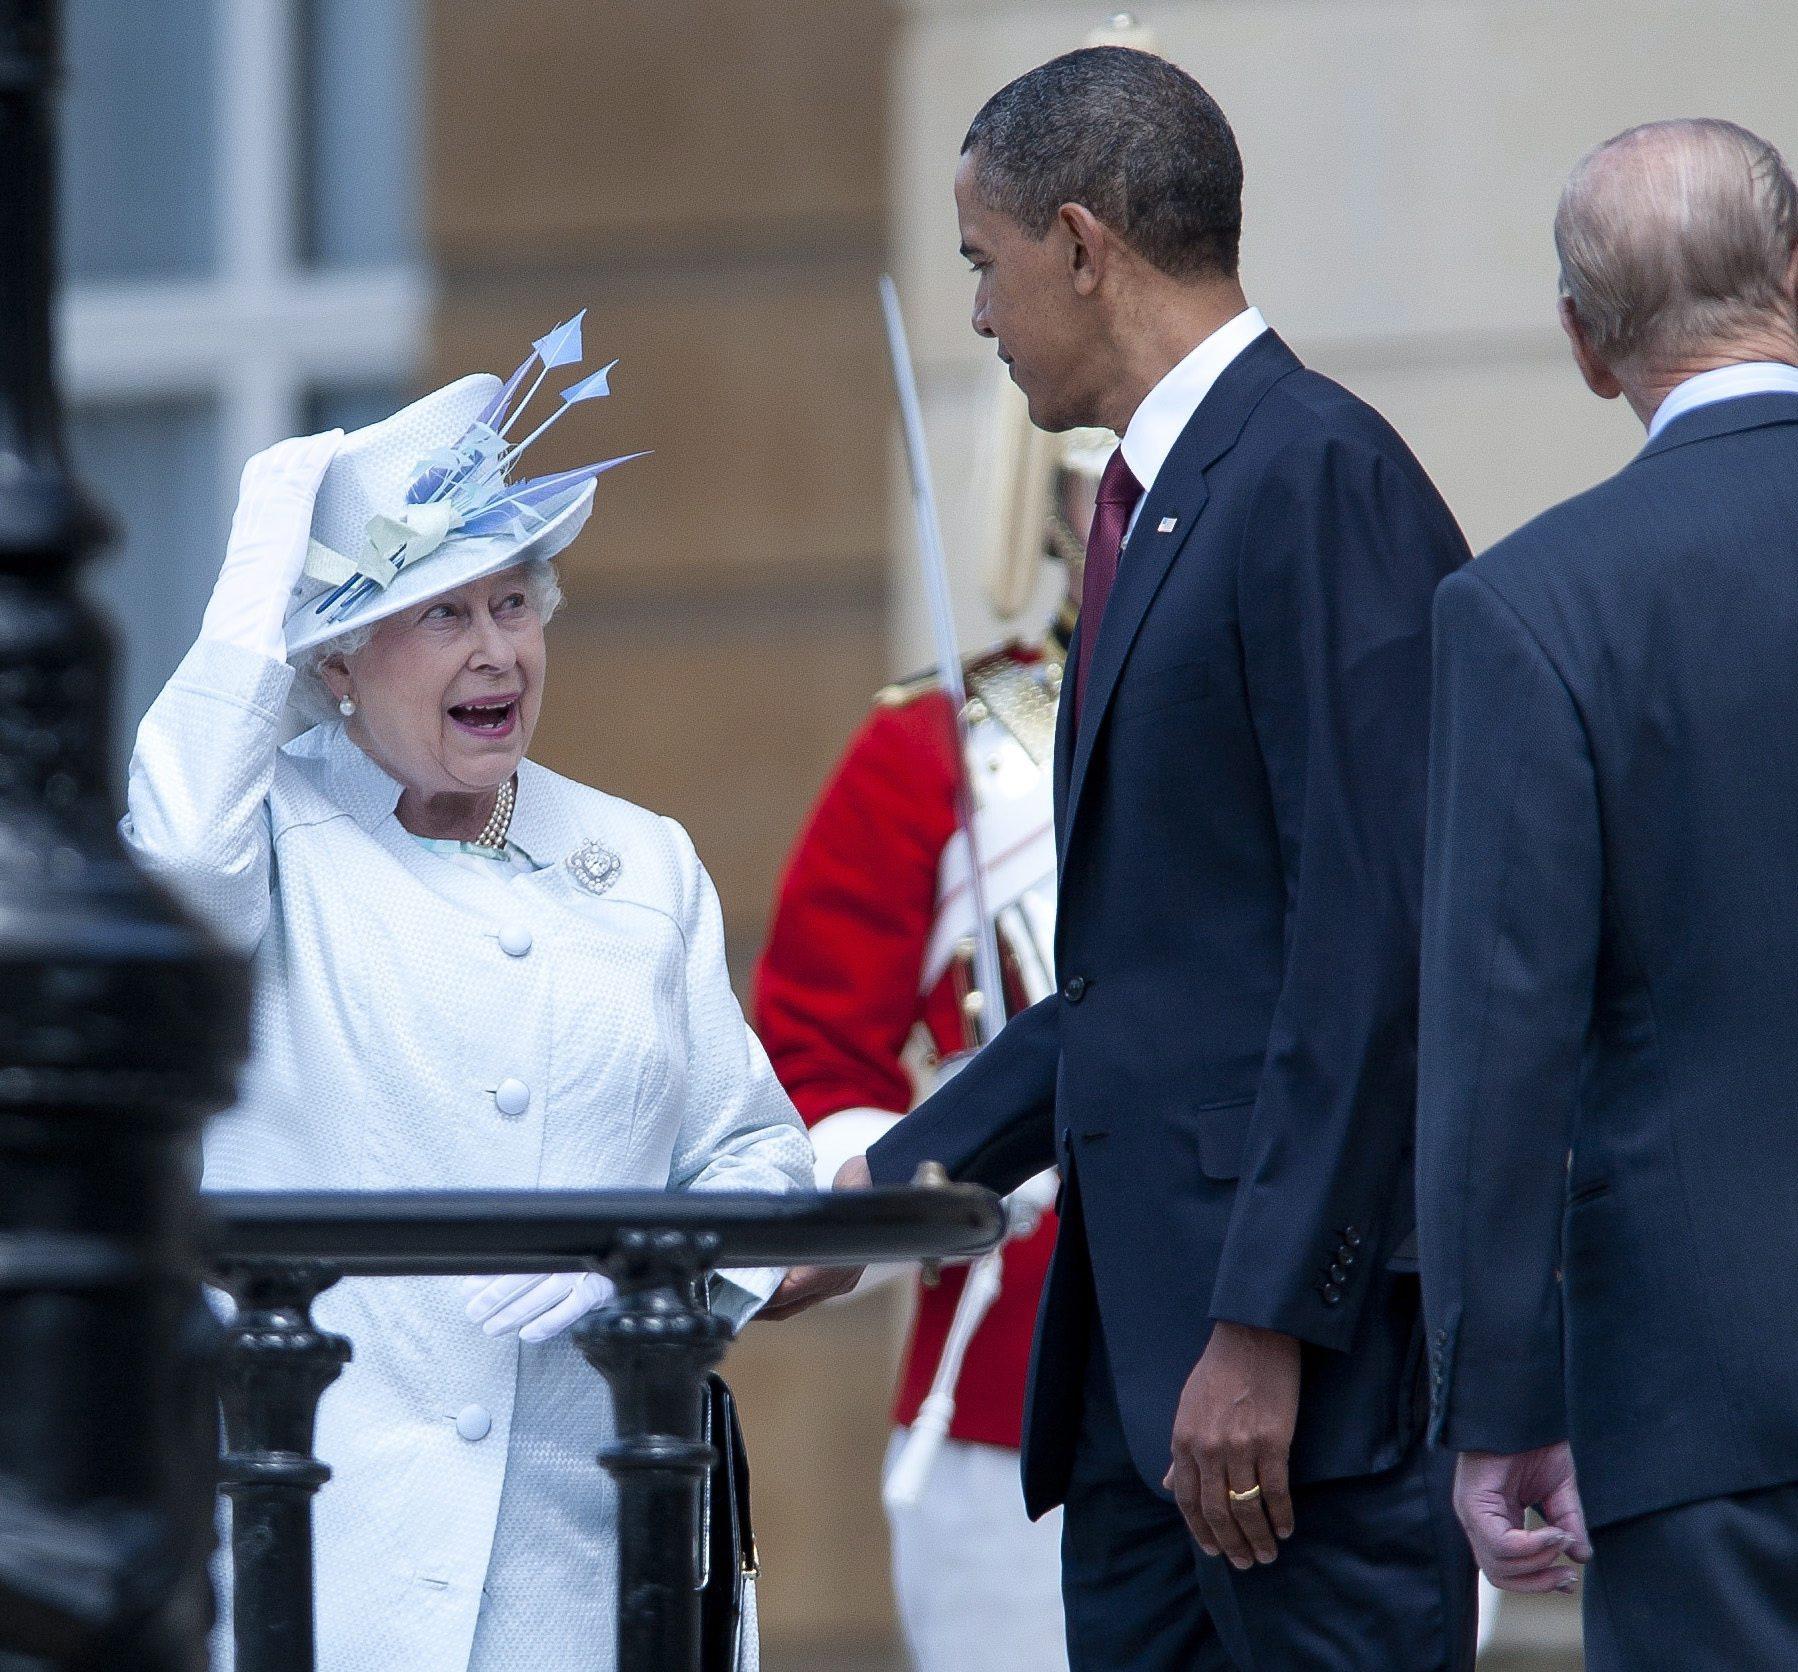 61 топовни салюта в Лондон в чест на Обама